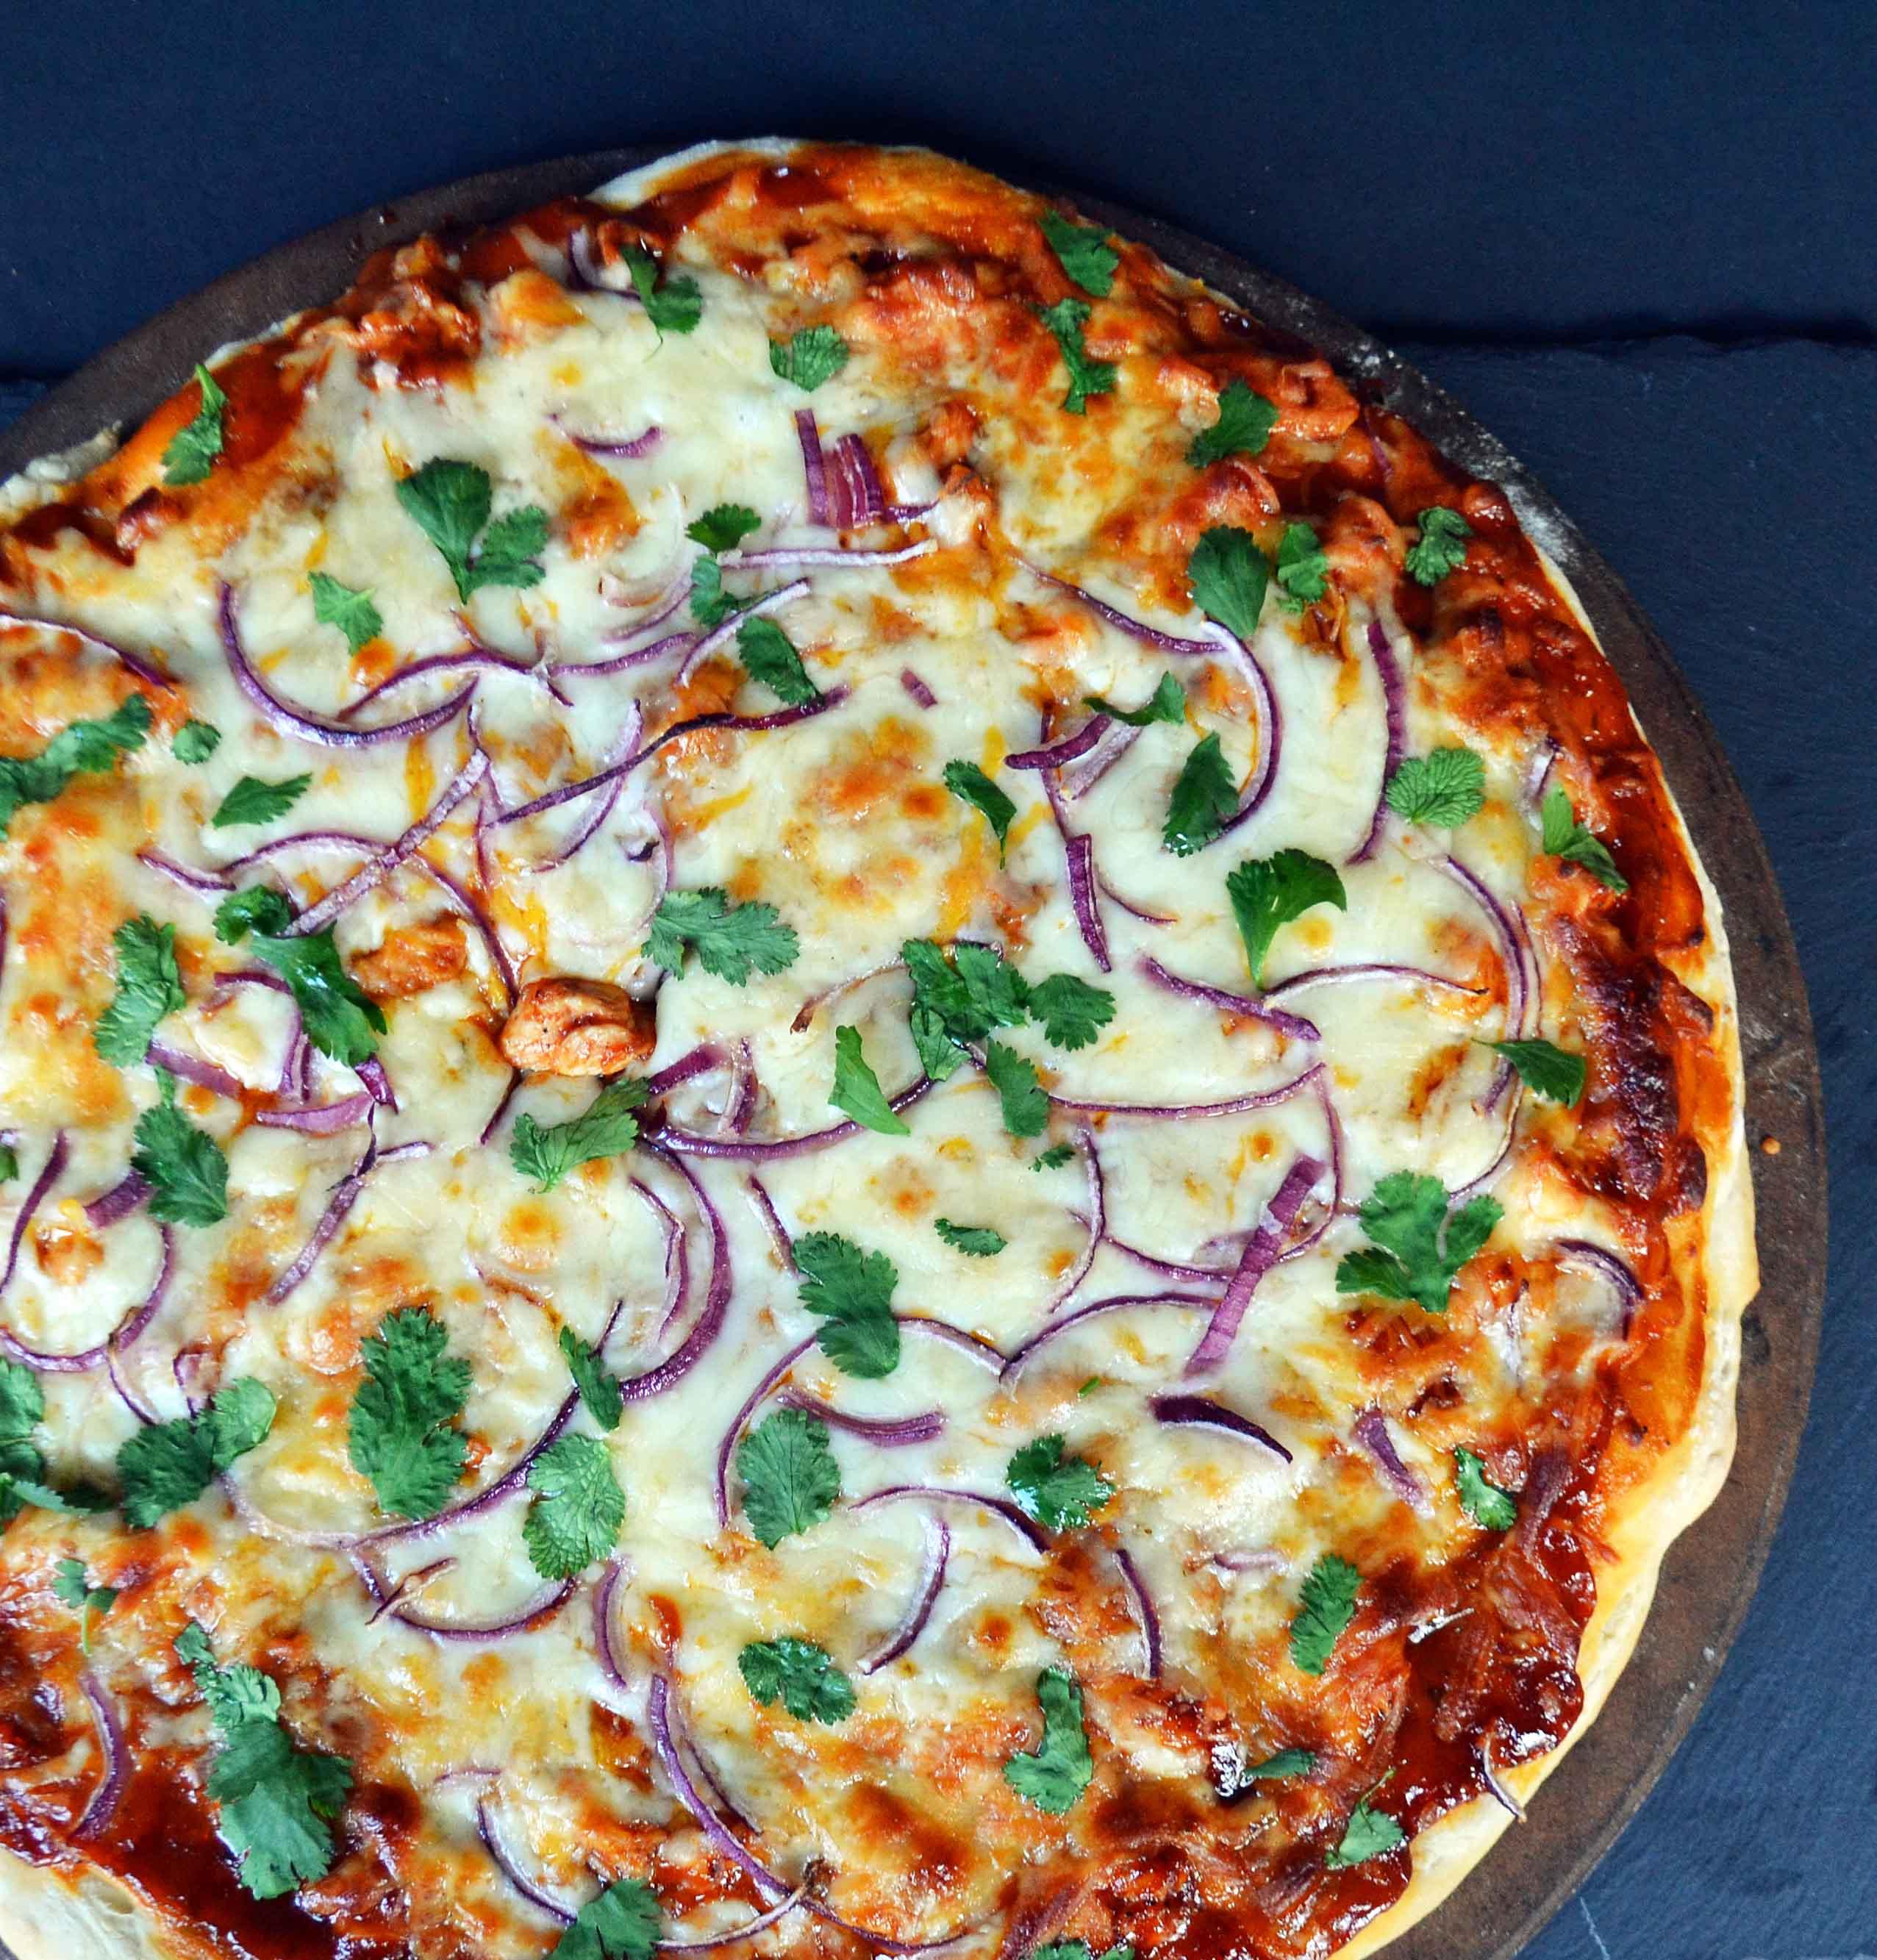 Homemade BBQ Chicken Pizza with a secret ingredient - by Modern Honey www.modernhoney.com